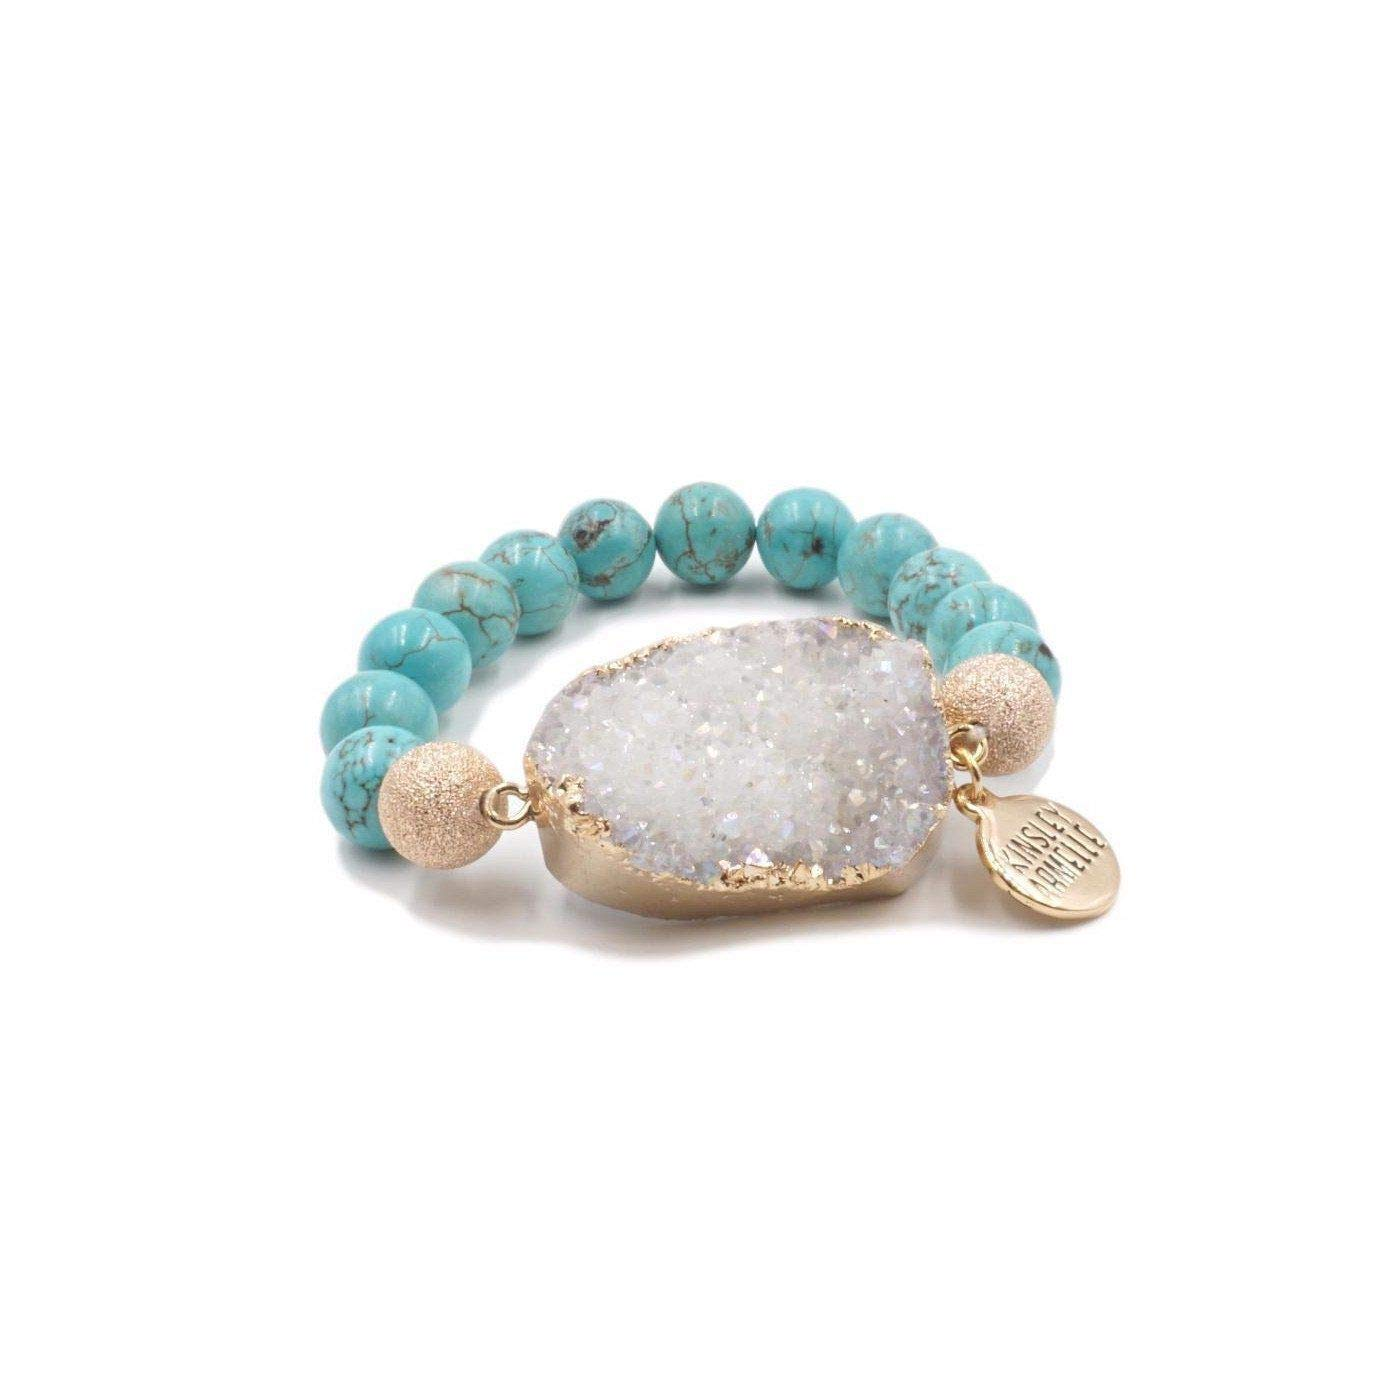 Kinsley Armelle Stone Collection - Aqua Marine Bracelet